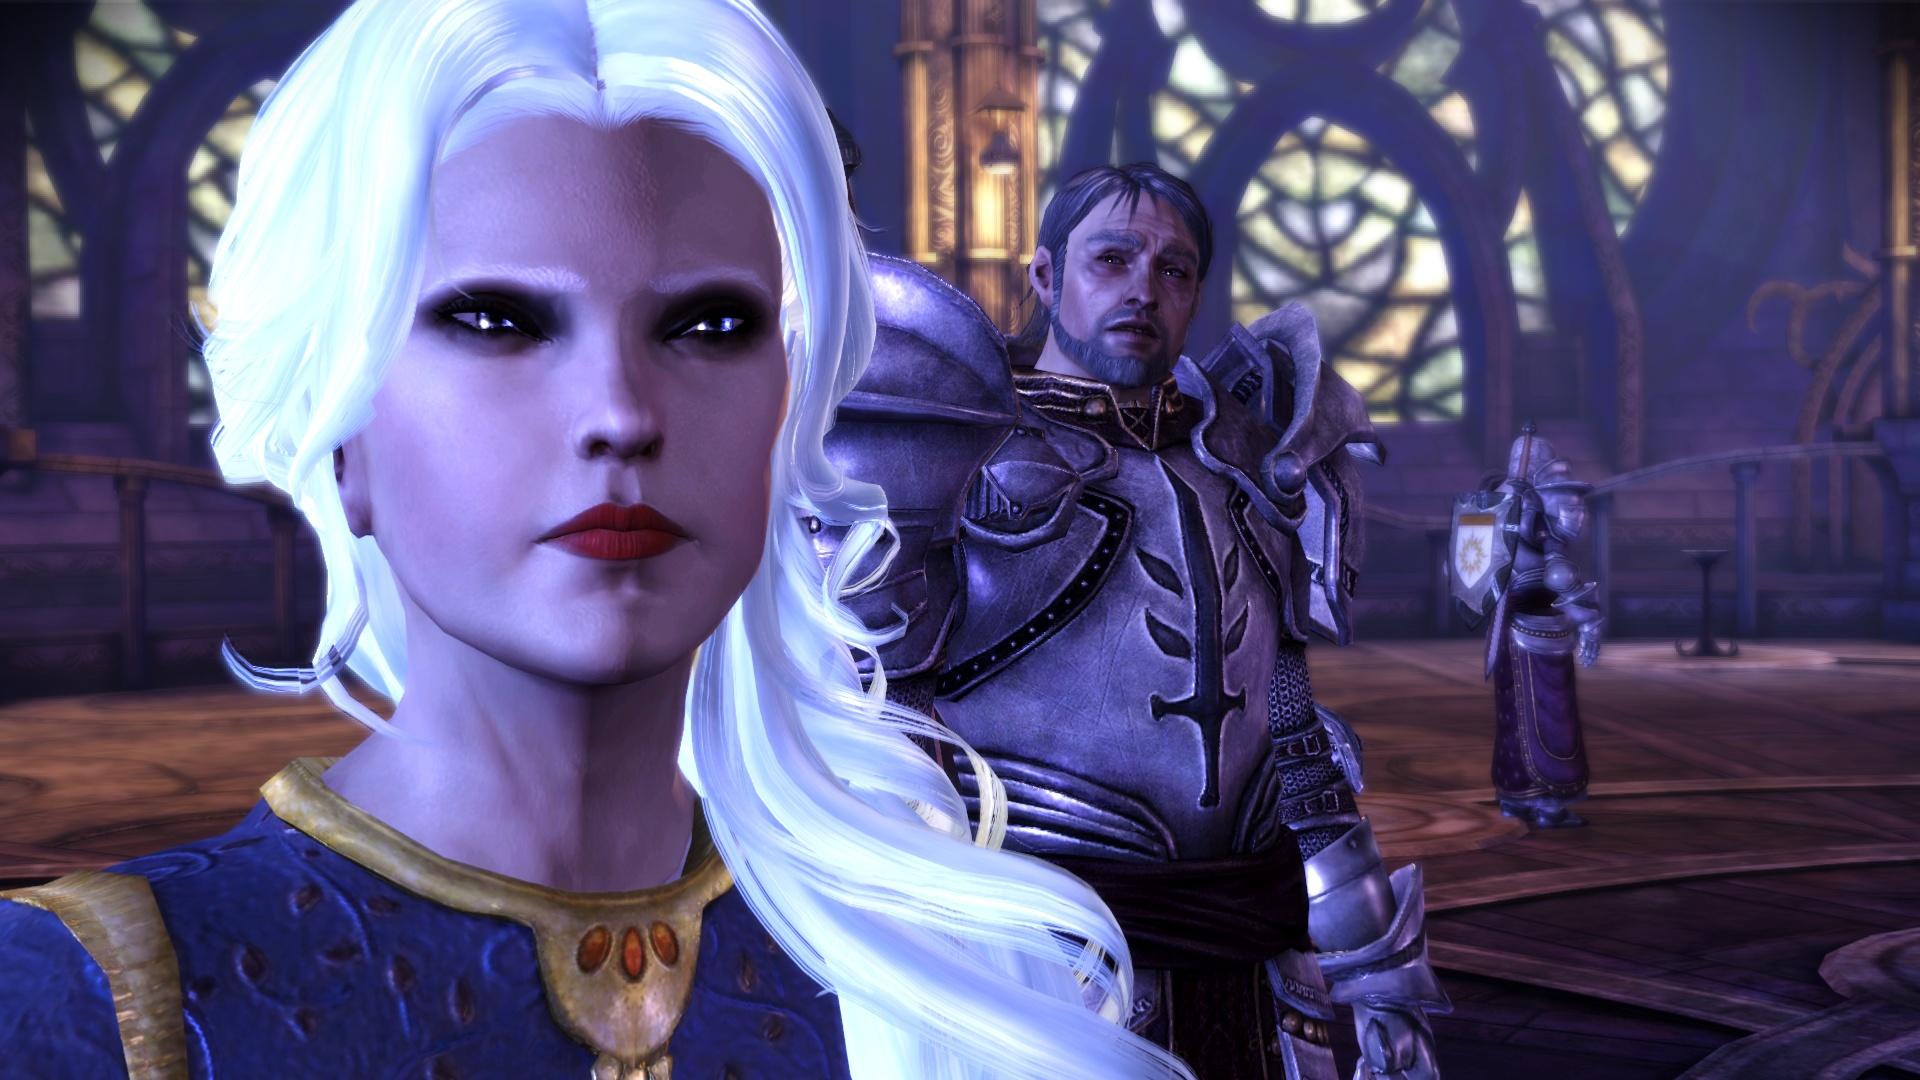 Les saga Dragon Age & Mass Effect - Page 3 1447255353-screenshot20151111145902901